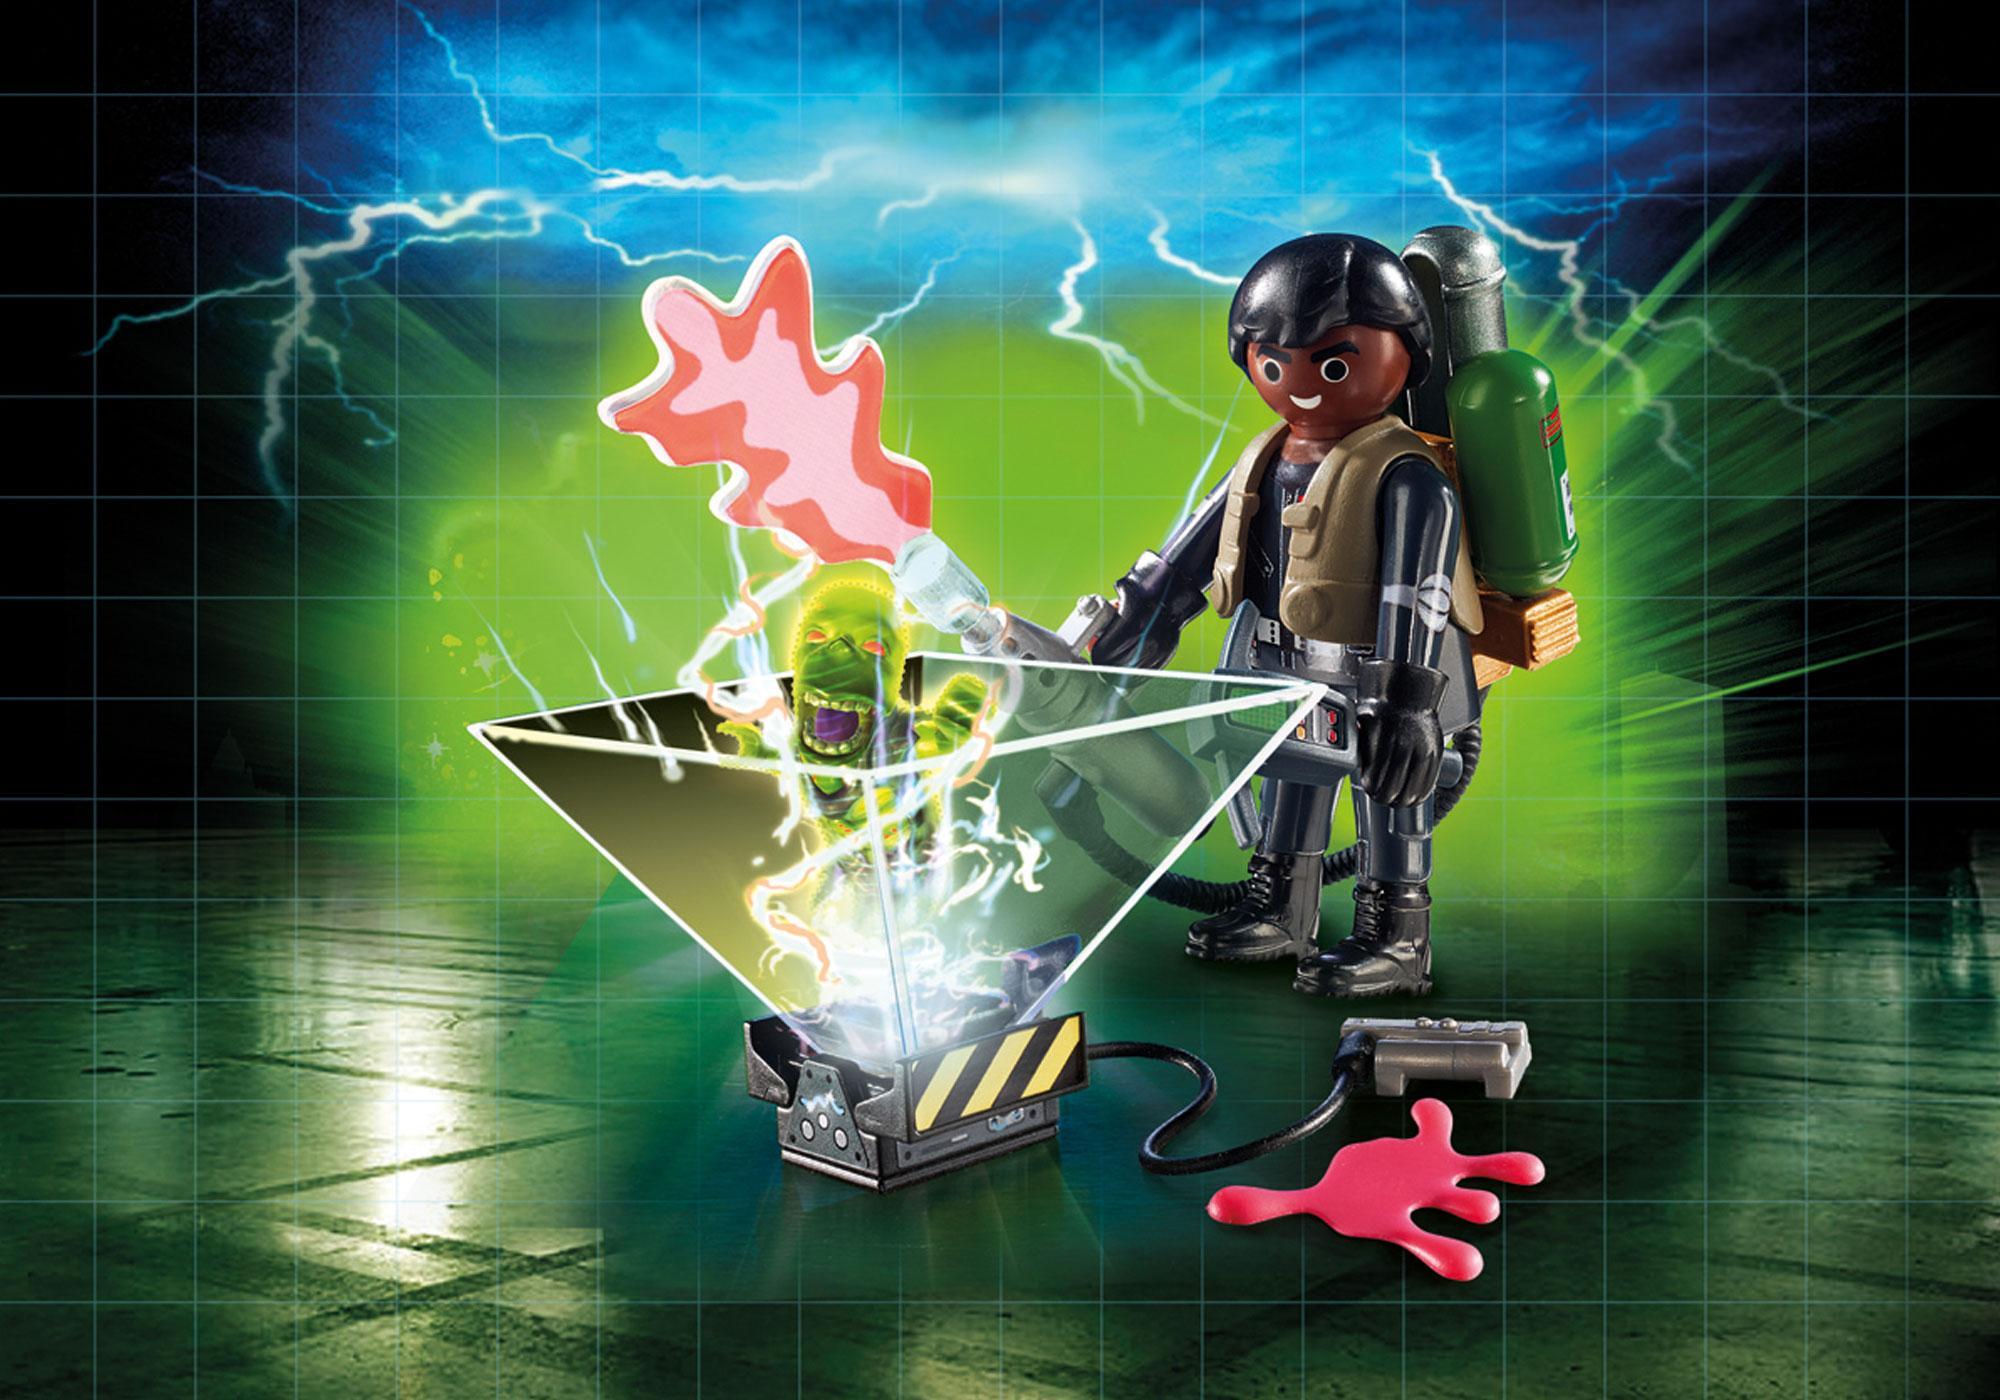 http://media.playmobil.com/i/playmobil/9349_product_detail/Ghostbuster Winston Zeddemore